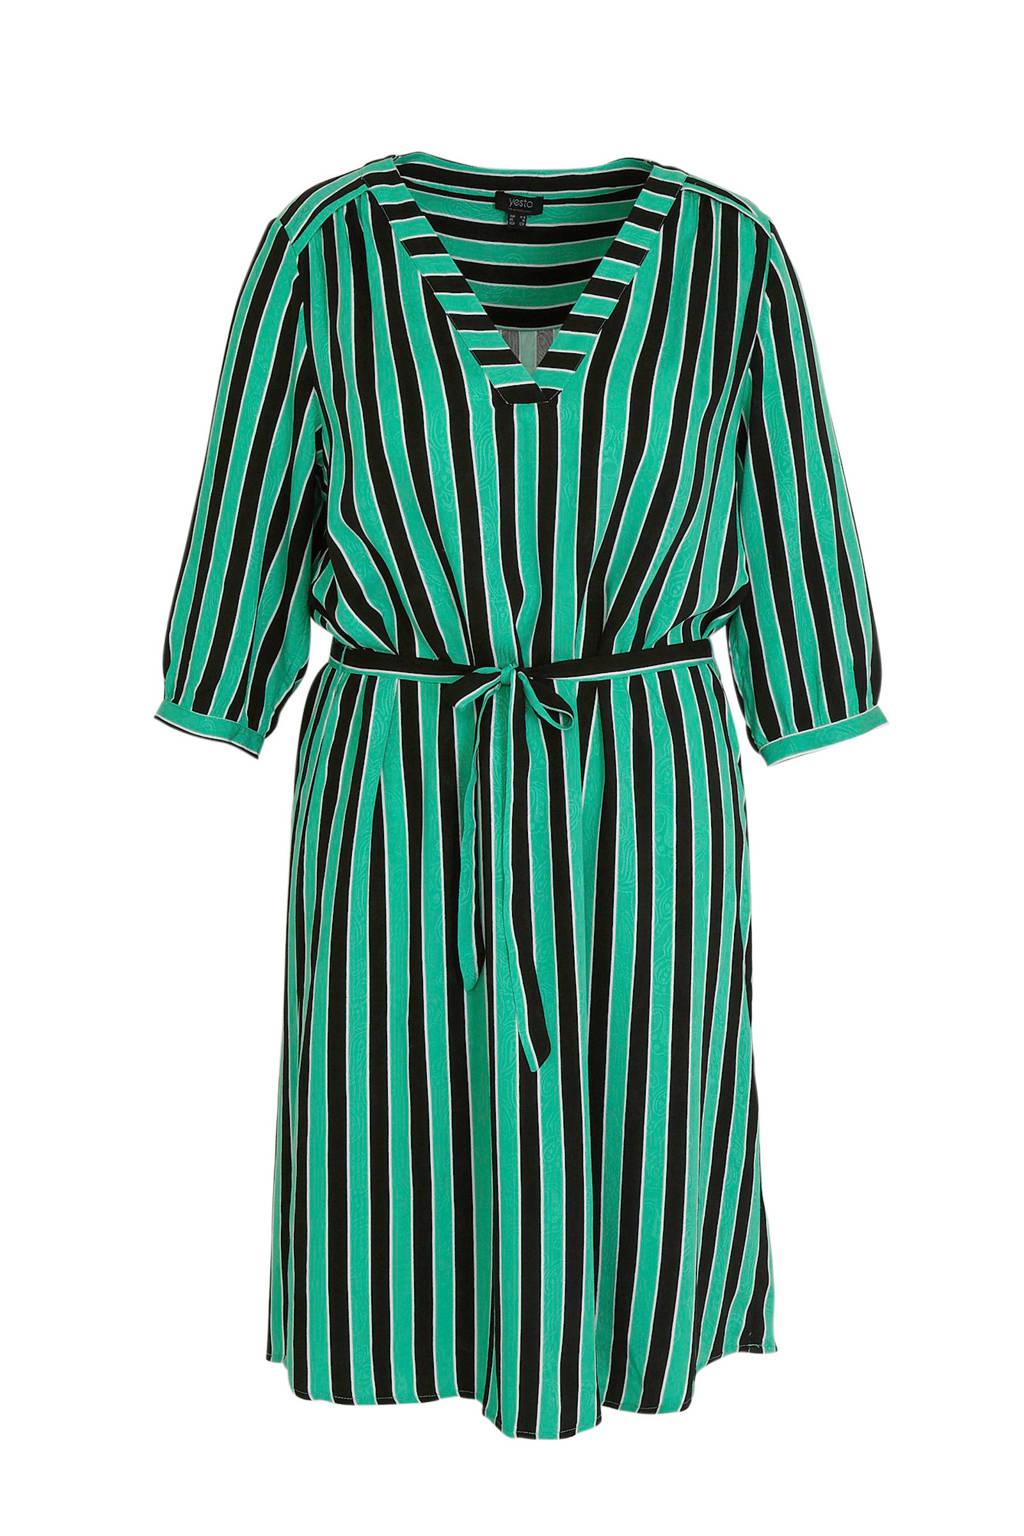 Yesta gestreepte jurk groen/multi, Groen/multi